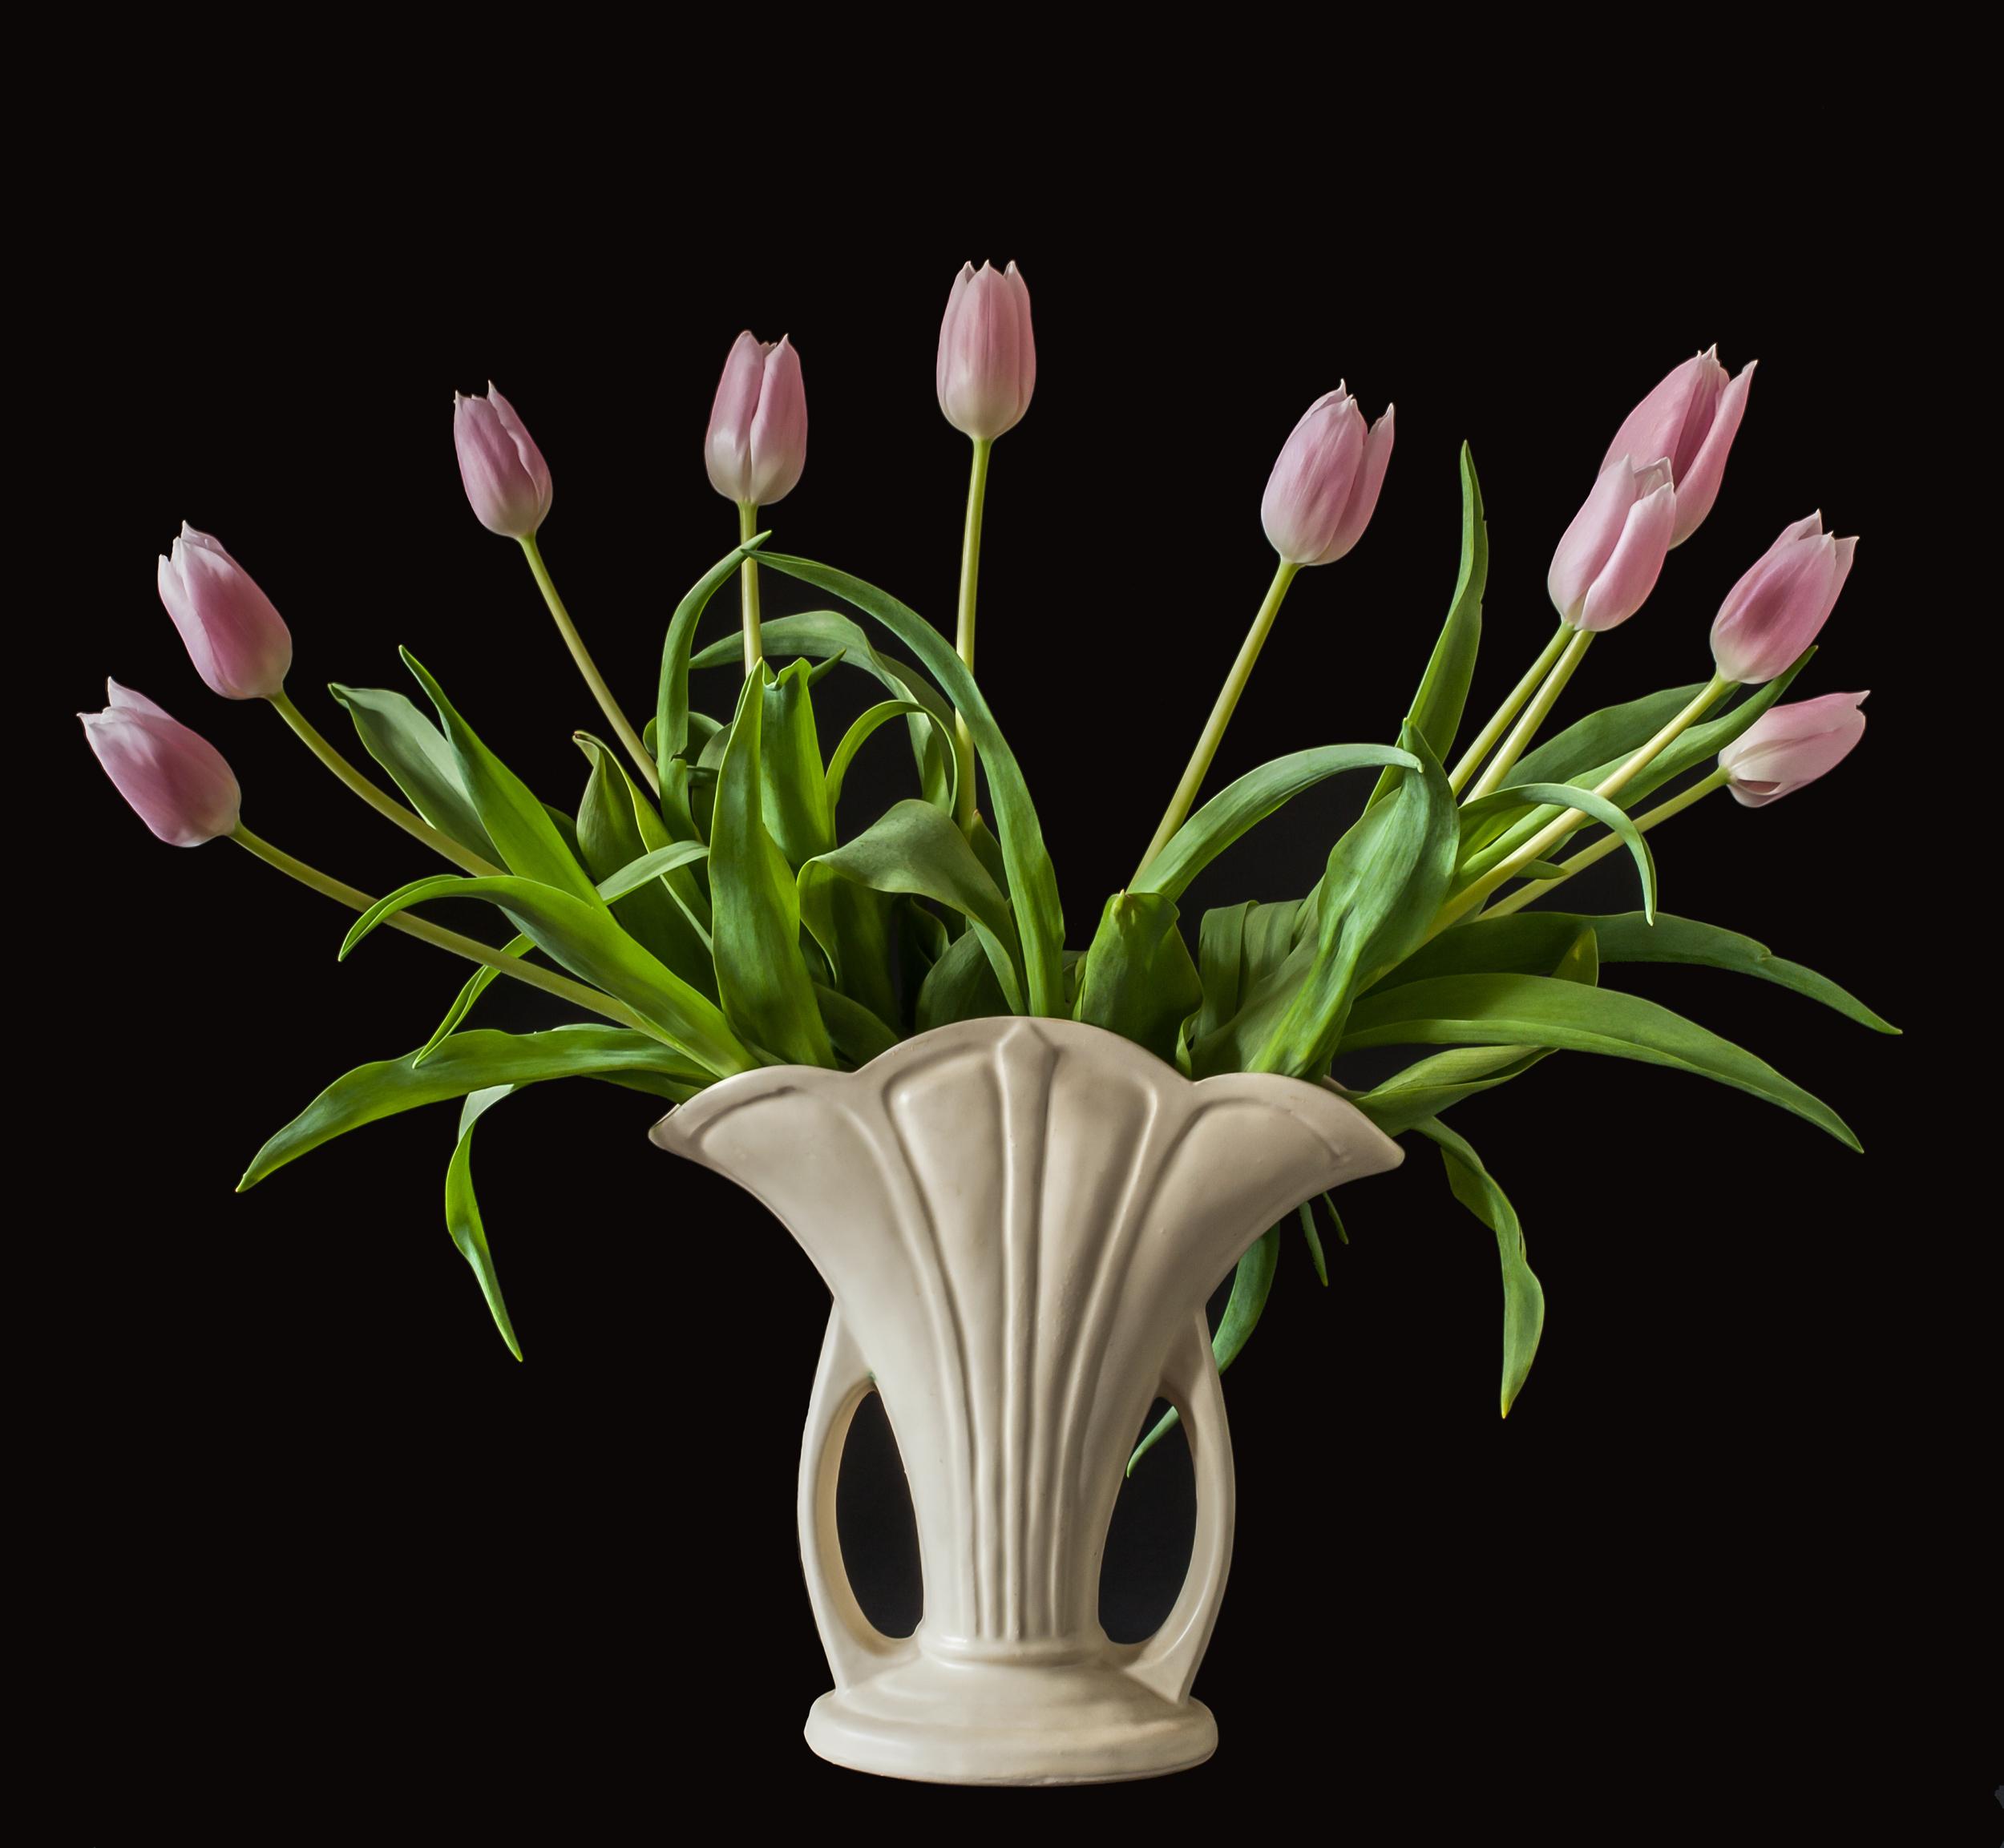 Pink Tulips, Vessel series